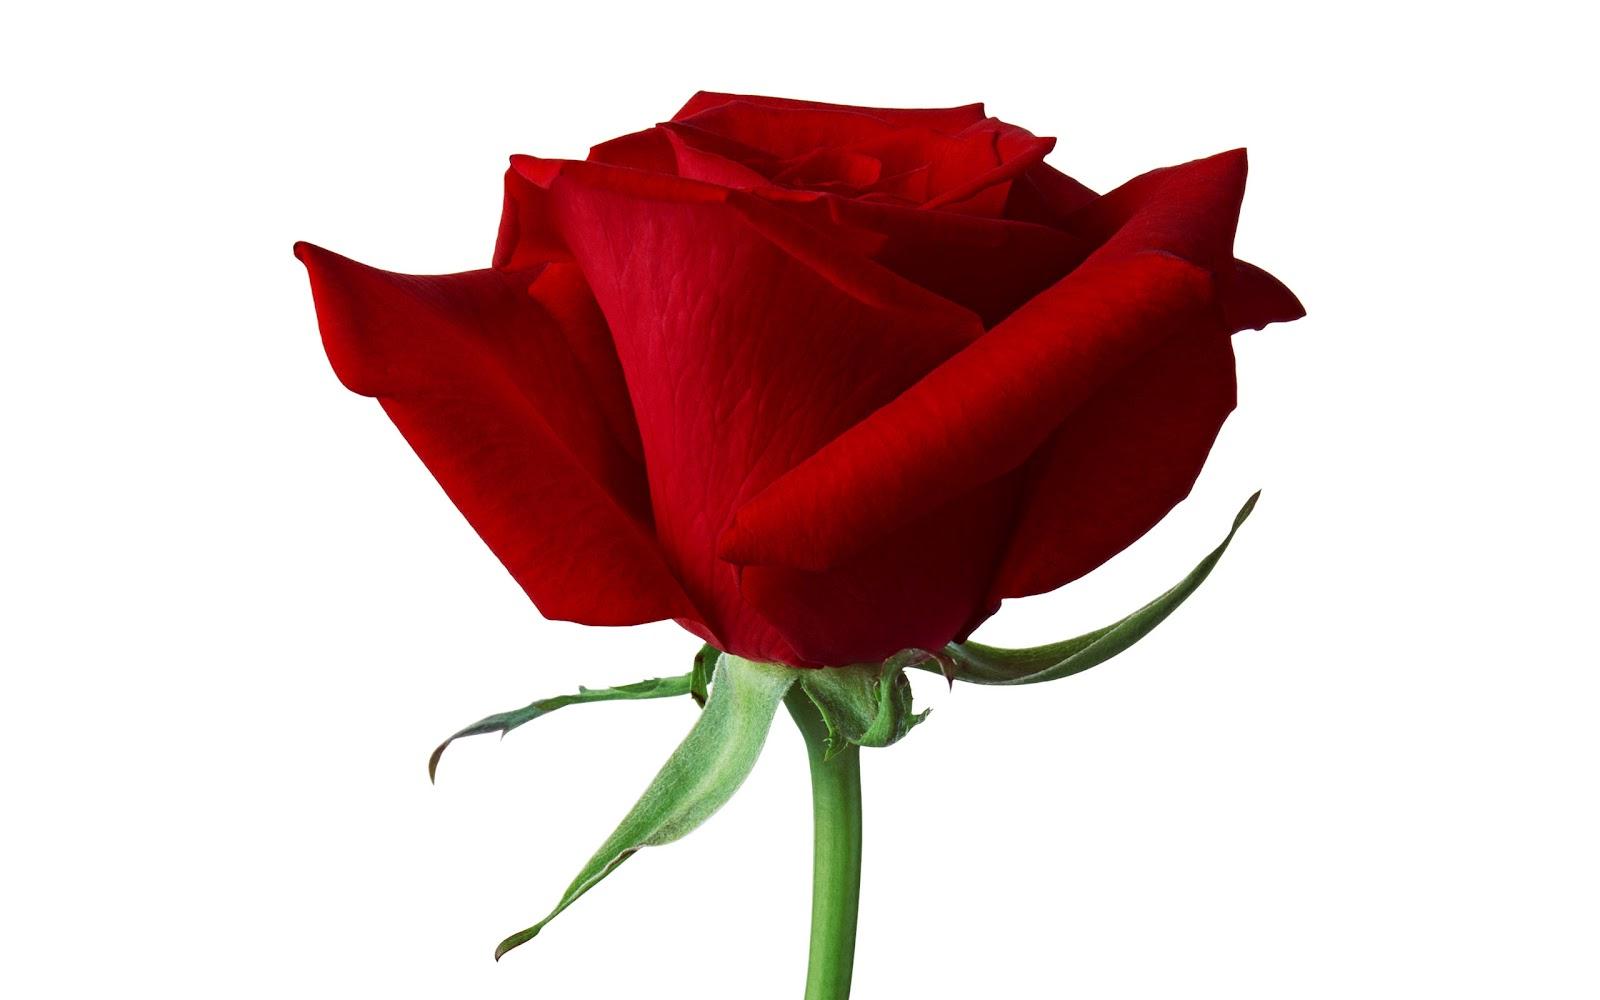 82 Wallpapers Flower Rose Love Wallpaper Cave Hd Love Rose Images